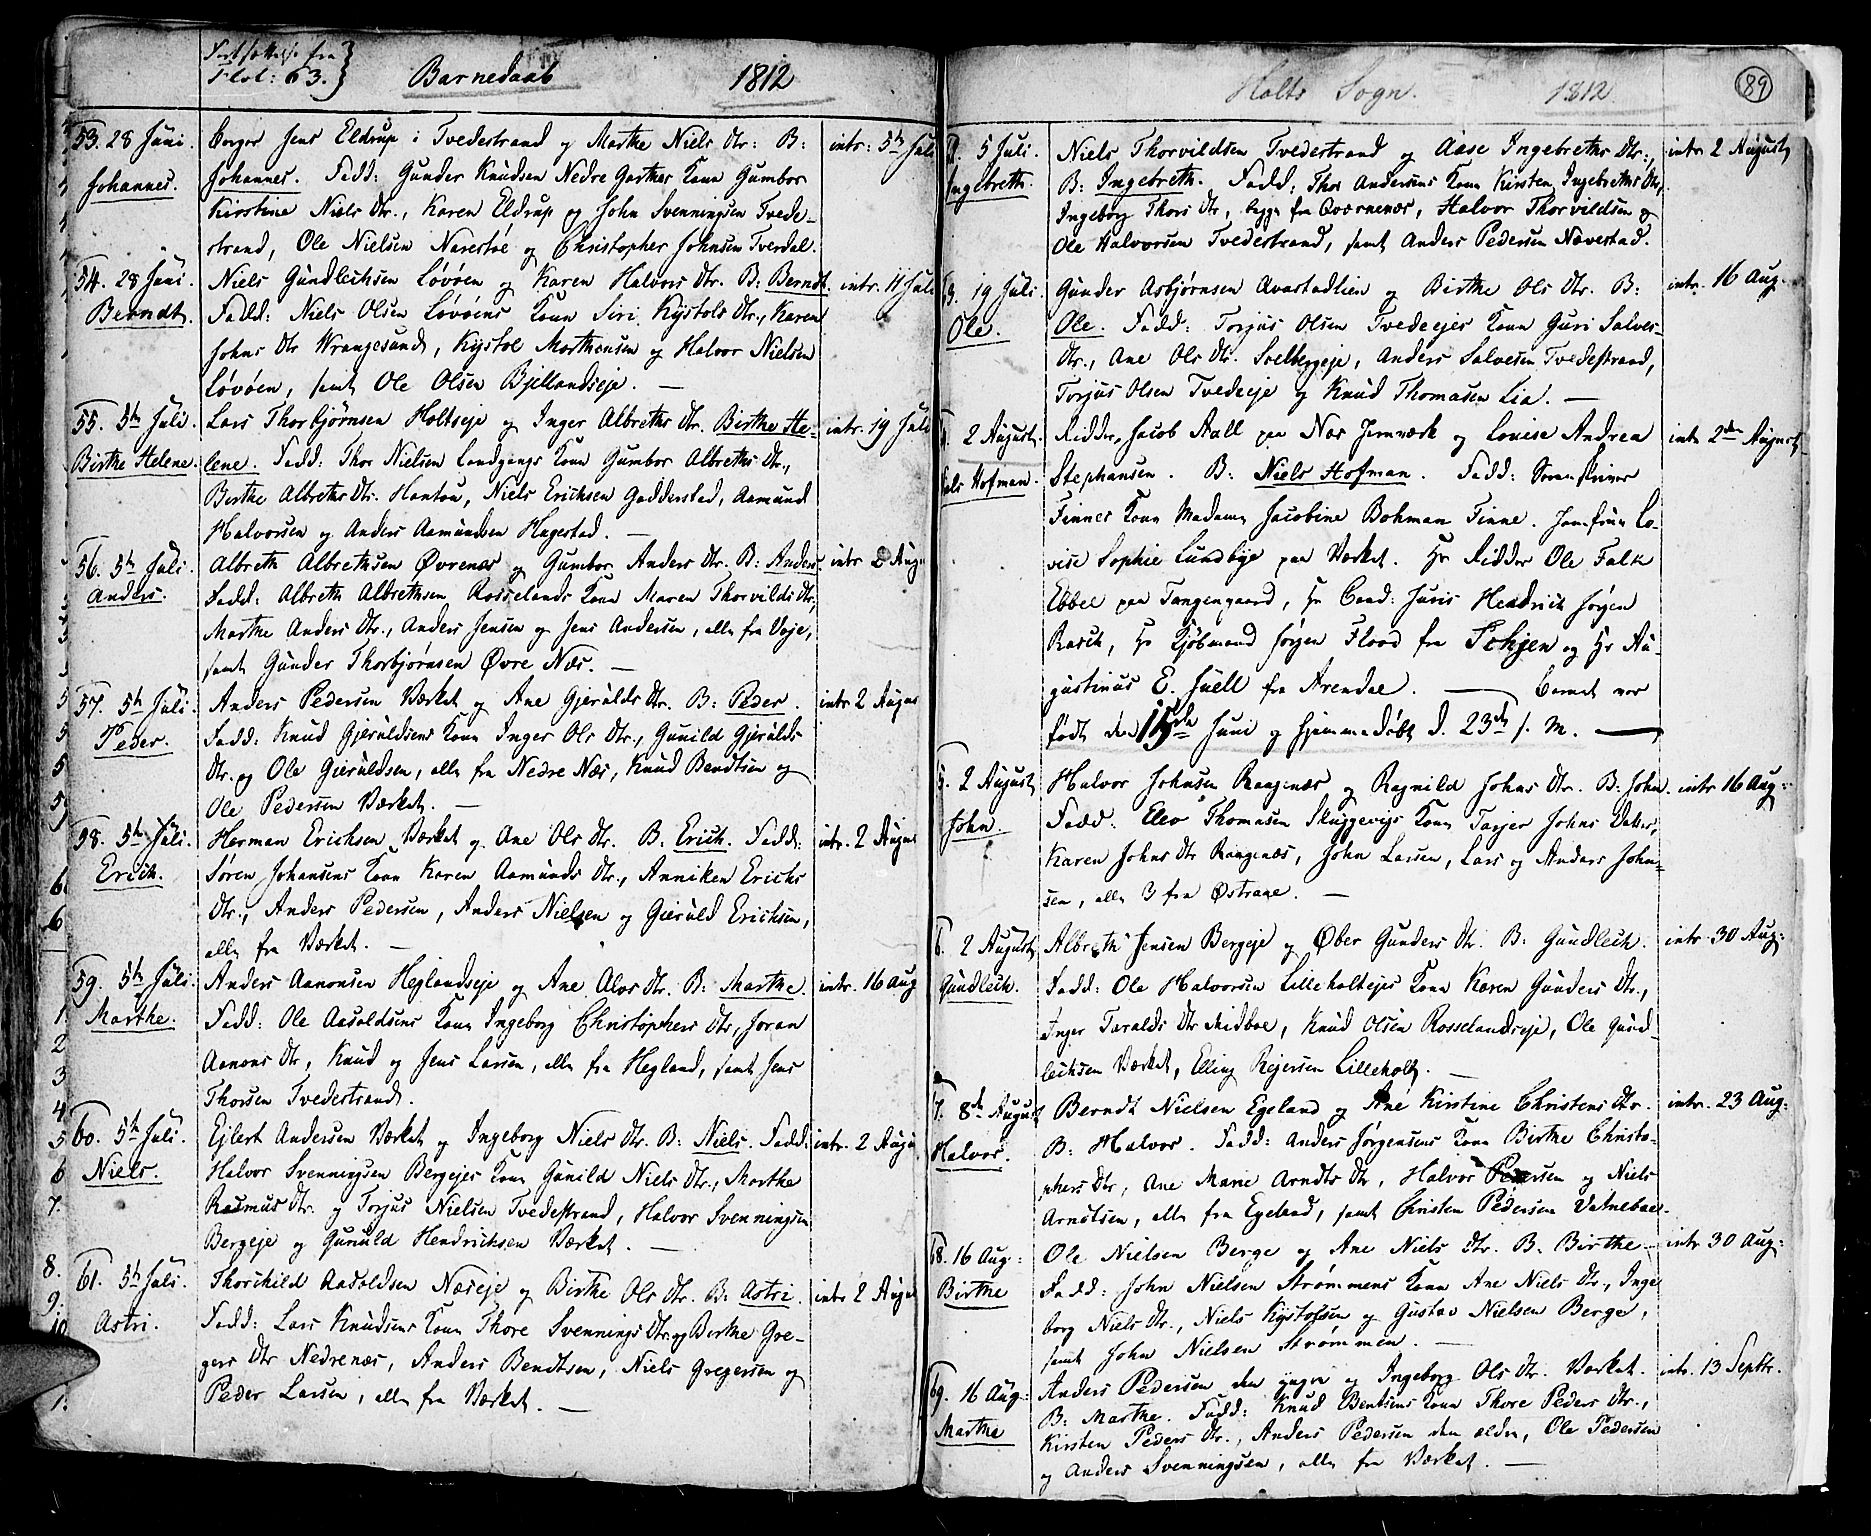 SAK, Holt sokneprestkontor, F/Fa/L0004: Ministerialbok nr. A 4, 1799-1813, s. 89